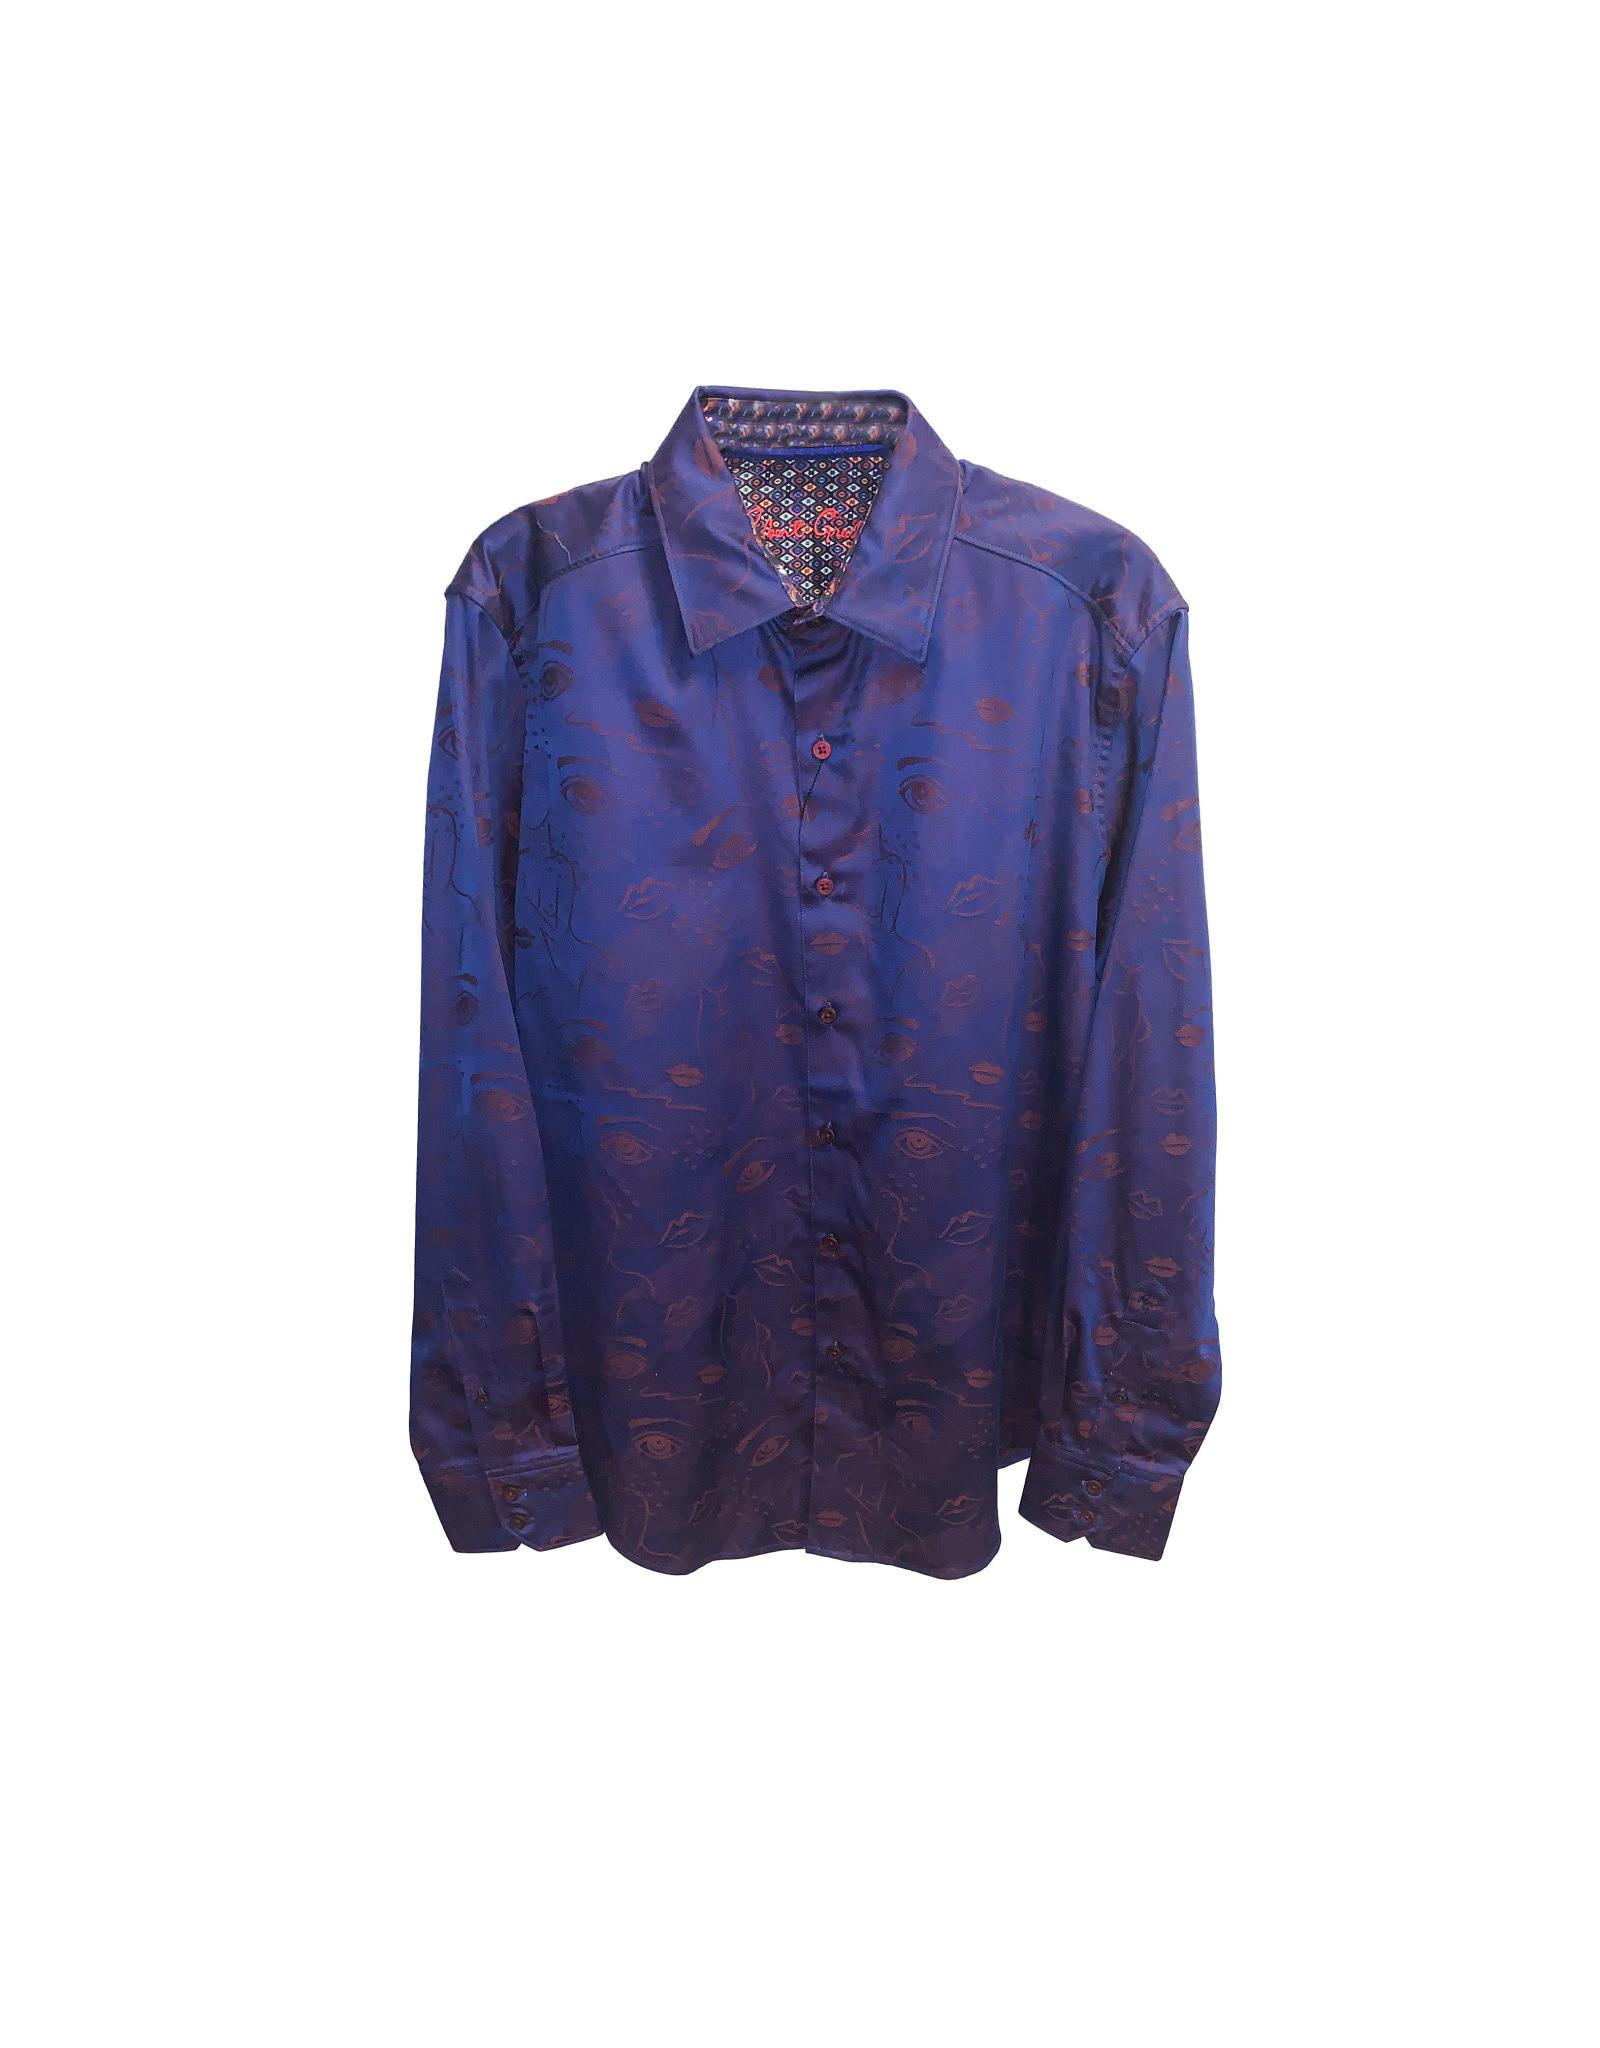 Robert Graham Robert Graham Frenchie Patterned Shirt Size: M